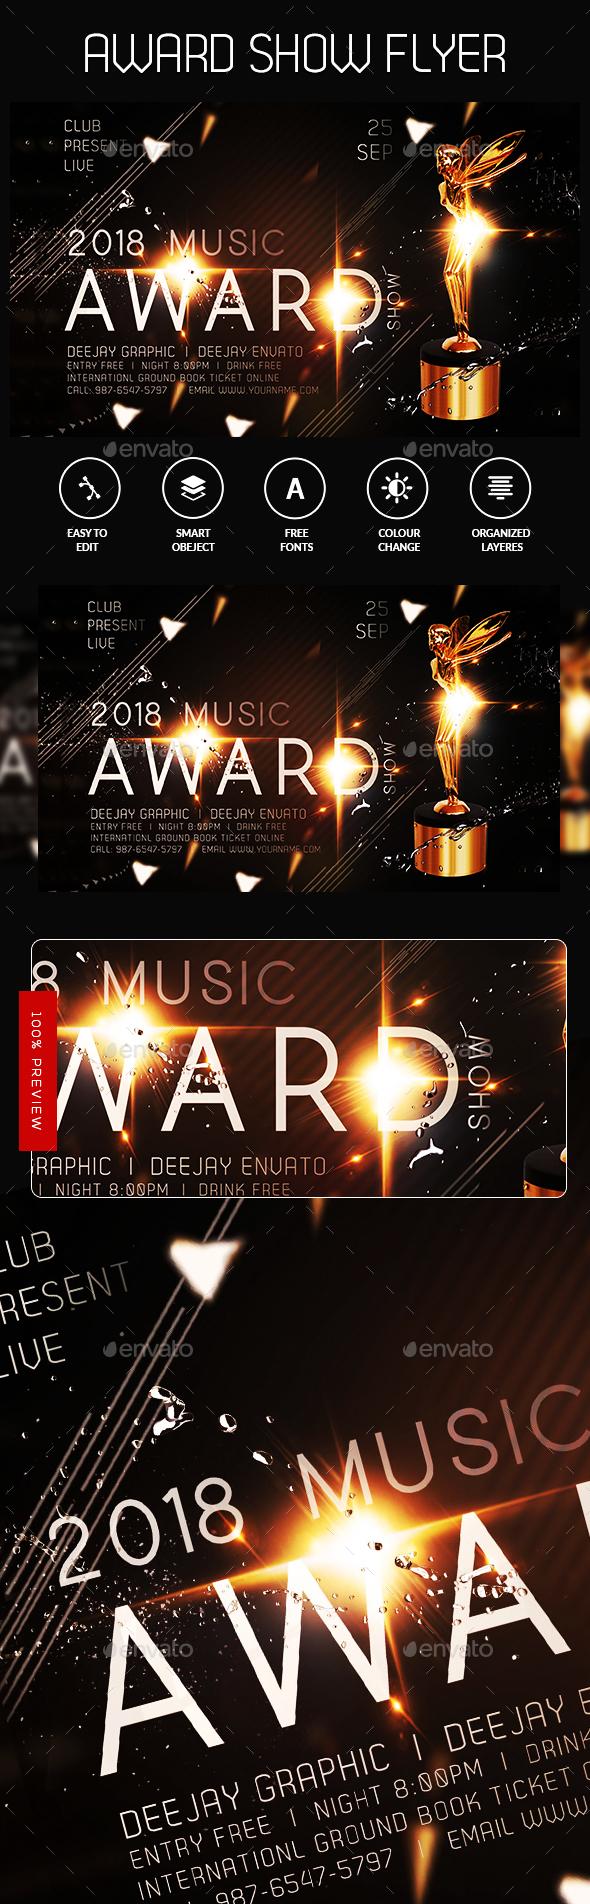 Music Award Flyer - Flyers Print Templates